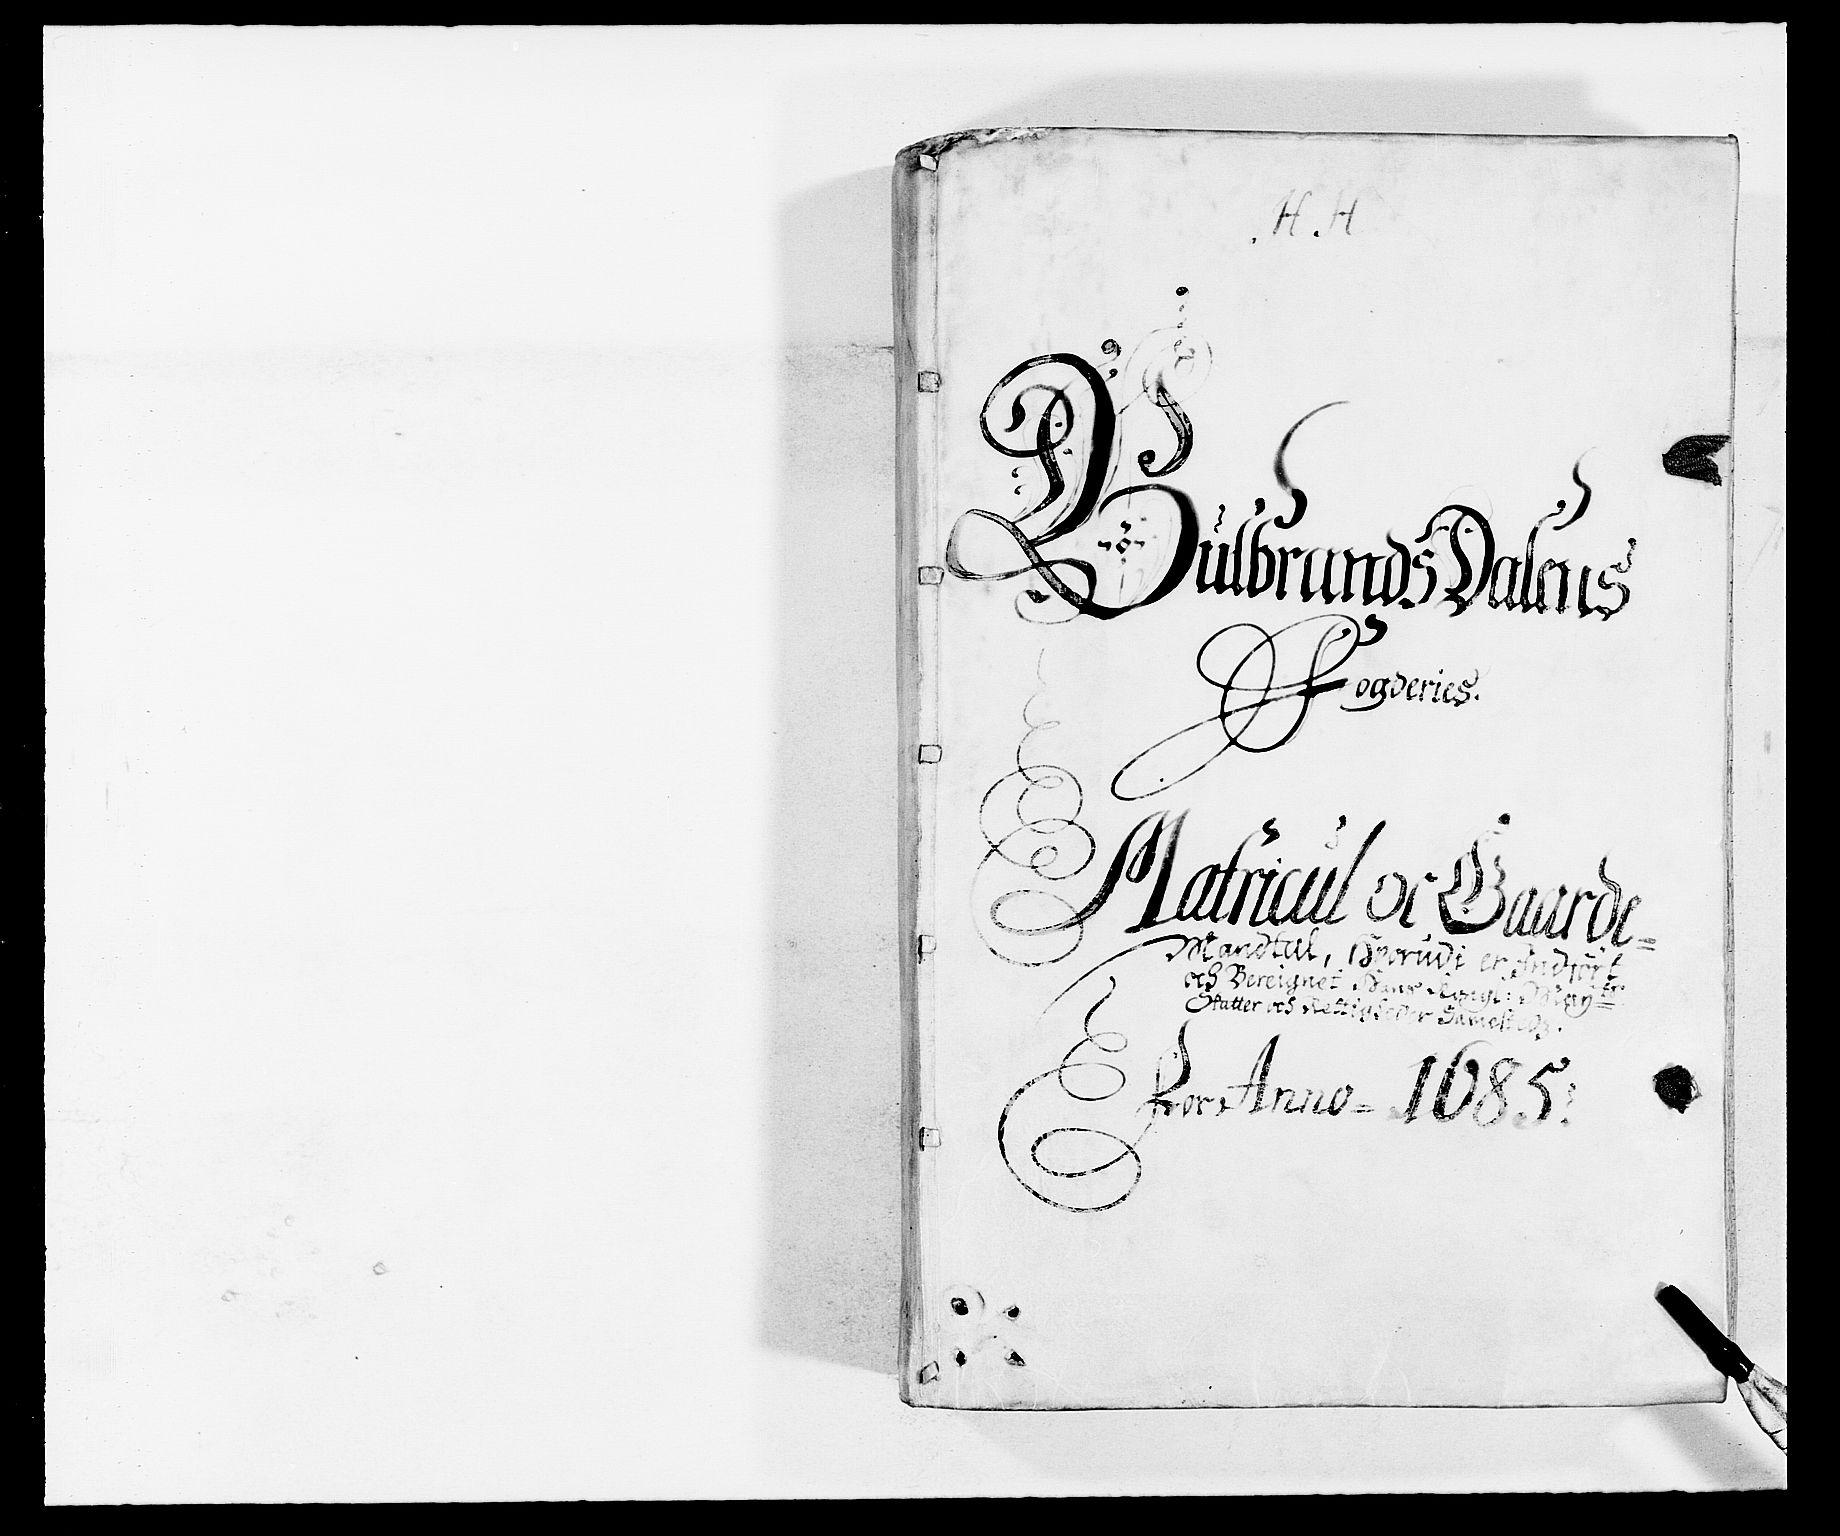 RA, Rentekammeret inntil 1814, Reviderte regnskaper, Fogderegnskap, R17/L1160: Fogderegnskap Gudbrandsdal, 1682-1689, s. 60